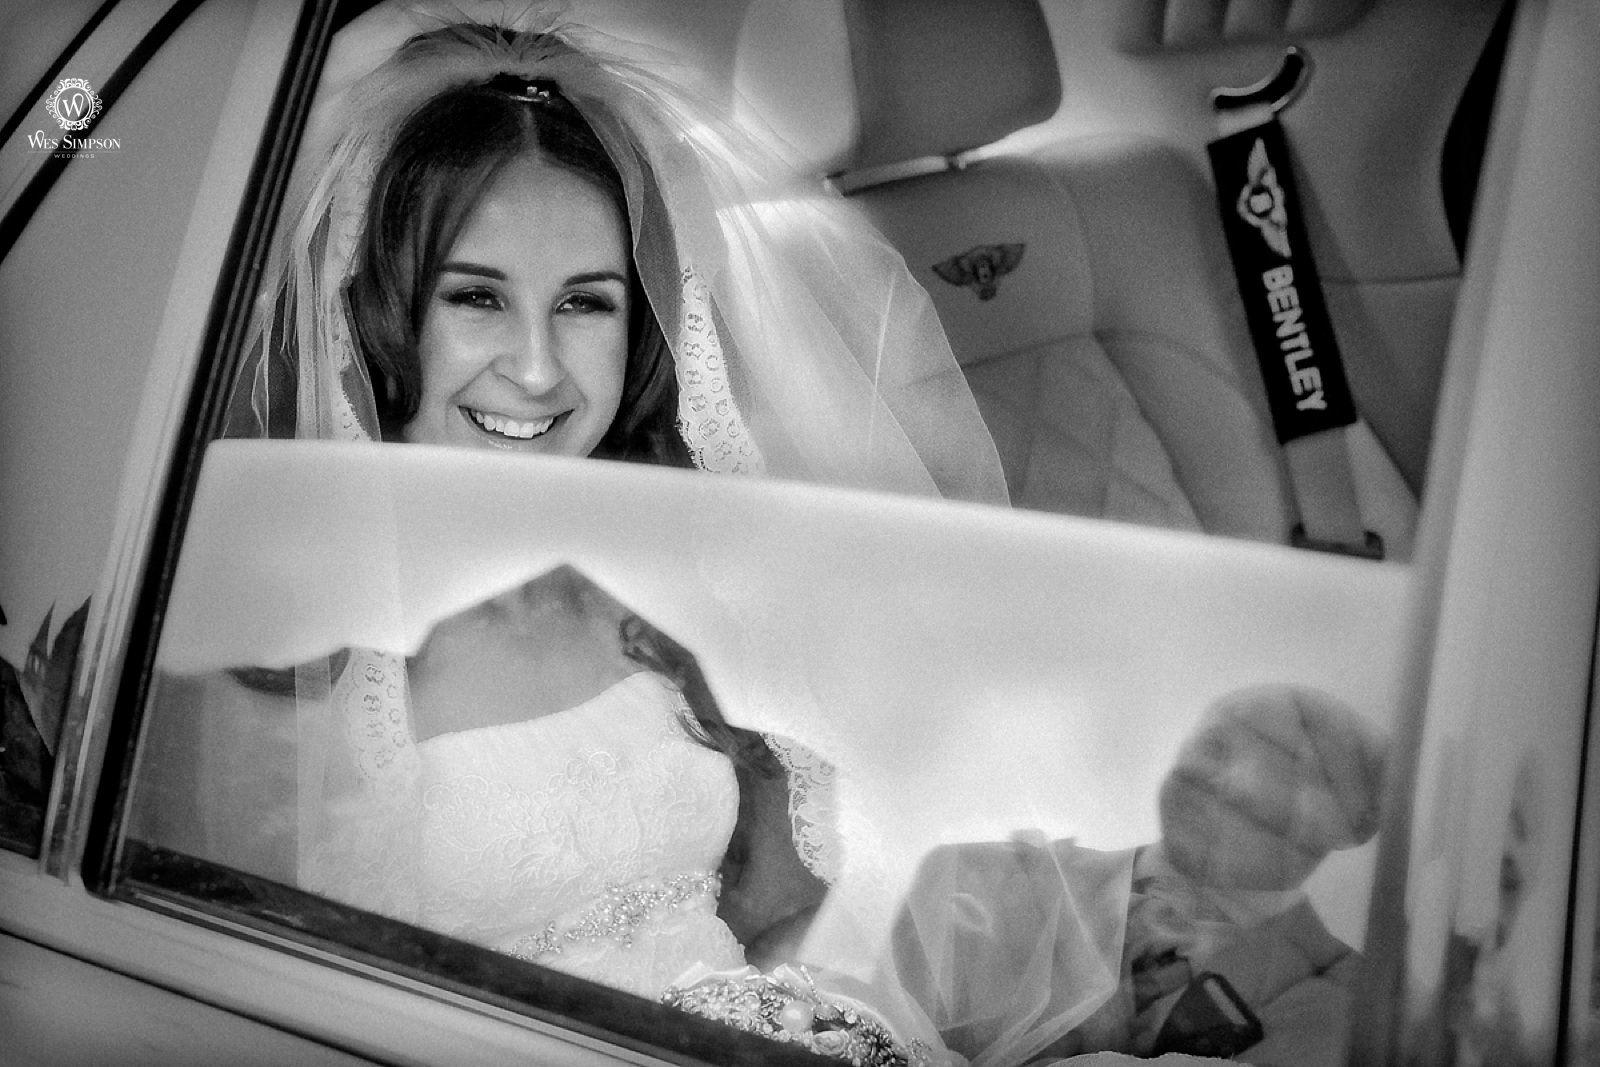 Wes Simpson wedding photography story